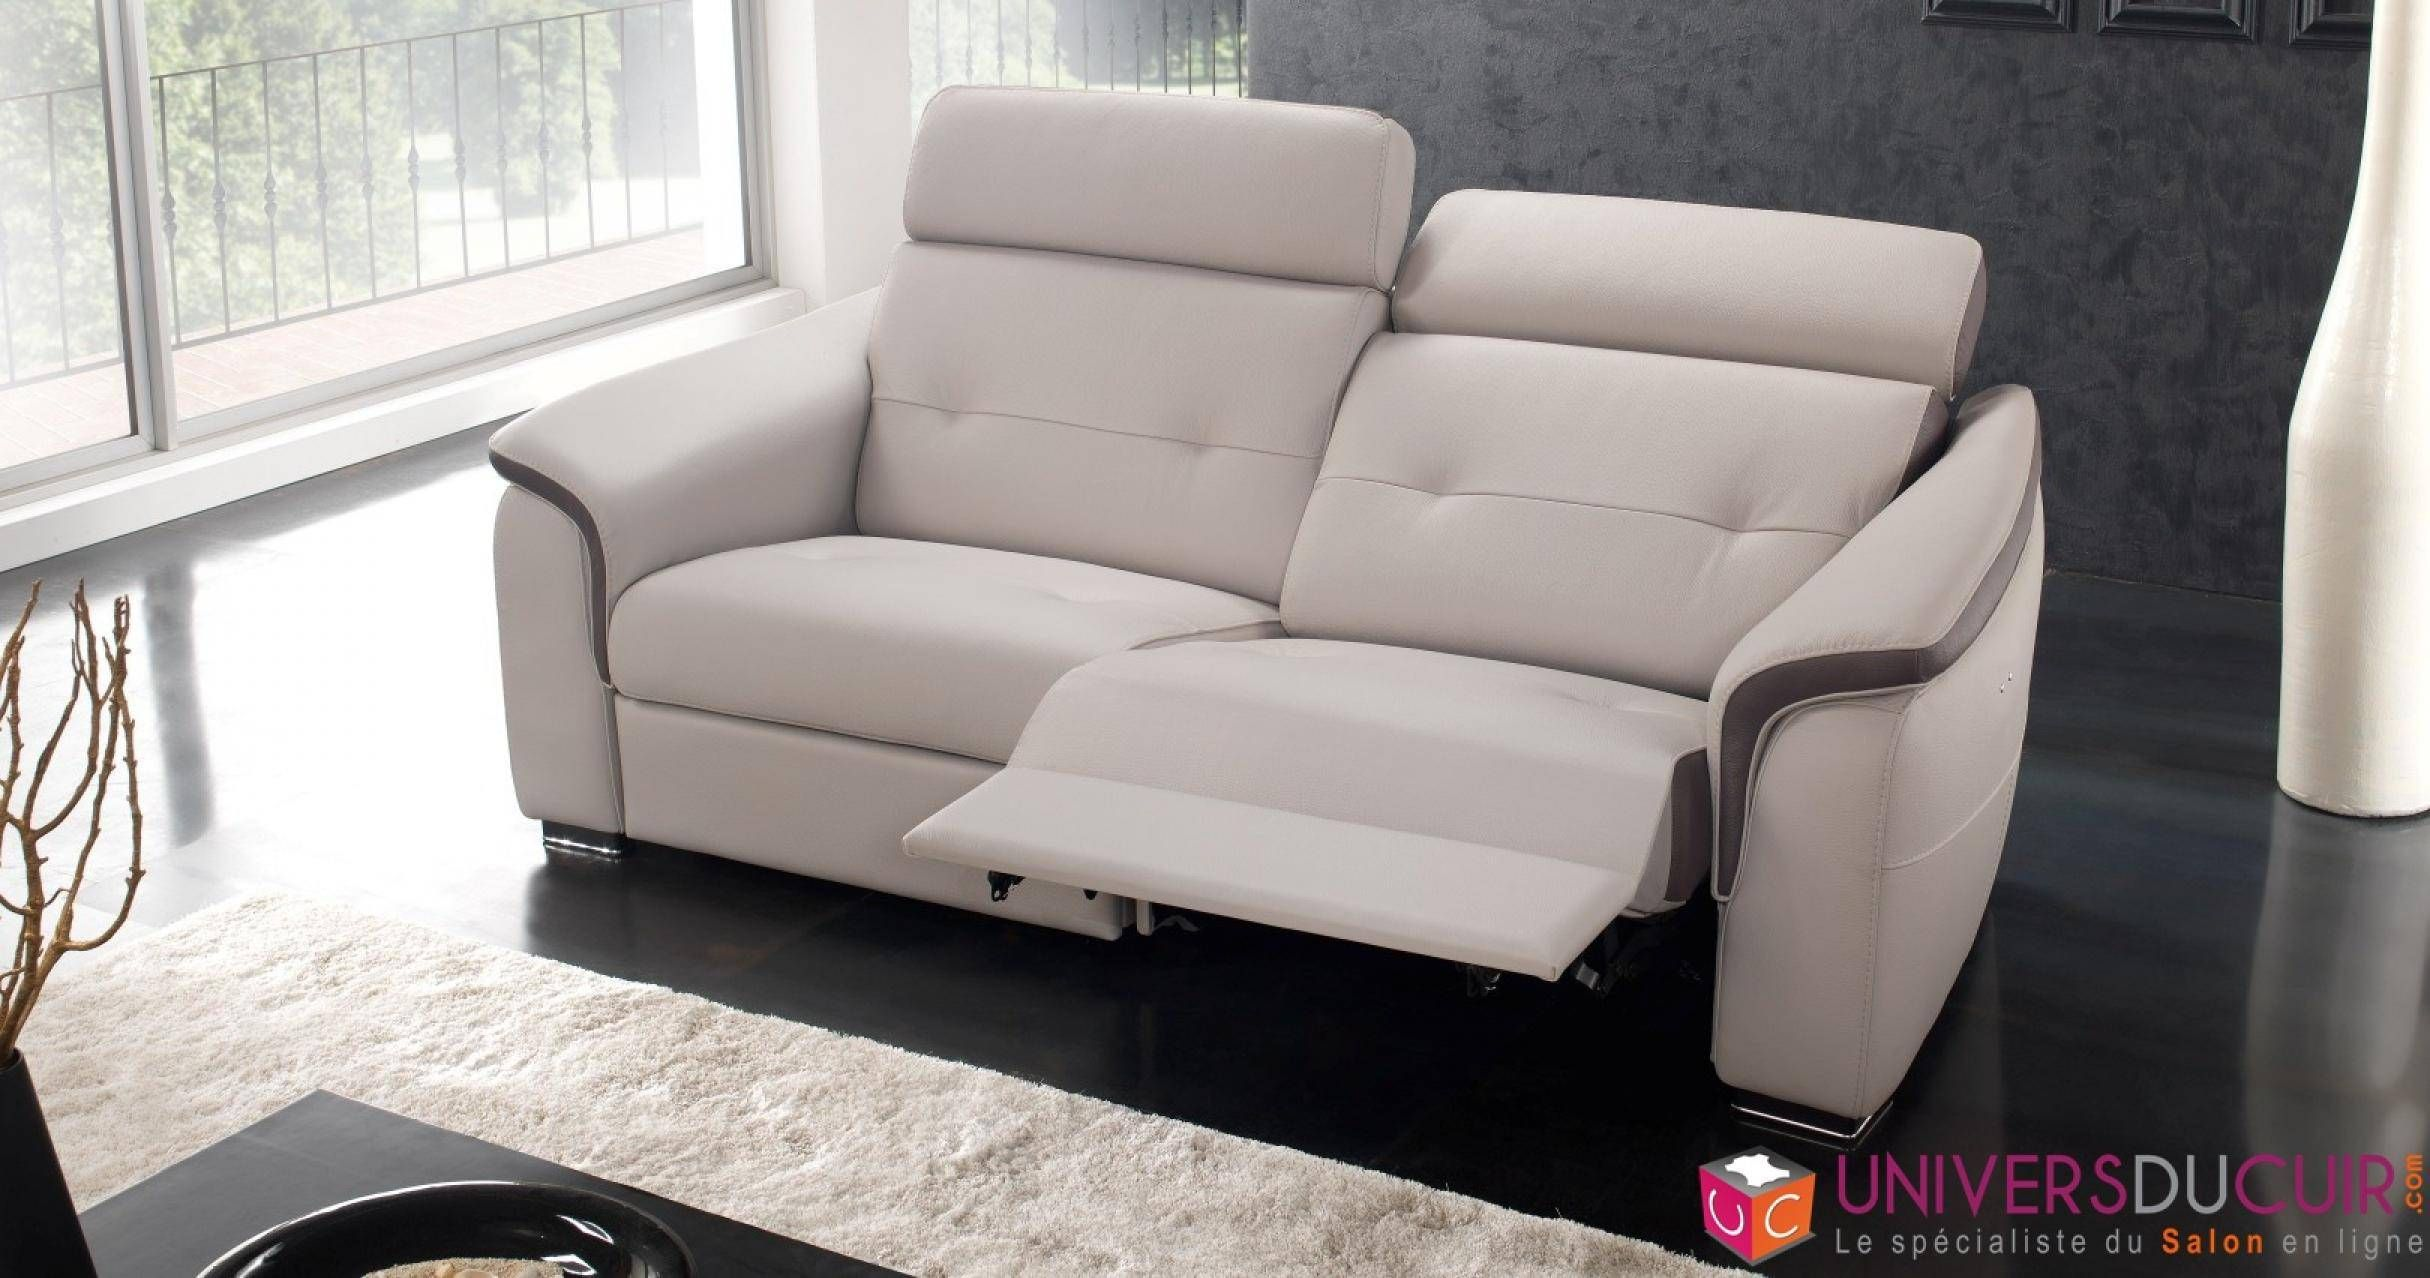 Canapcuir Canape Cuir Relax Electrique Conforama Castorama Canape Lit Maison Design Wiblia Check More At Https Marcgoldinteri In 2020 Home Decor Love Seat Furniture